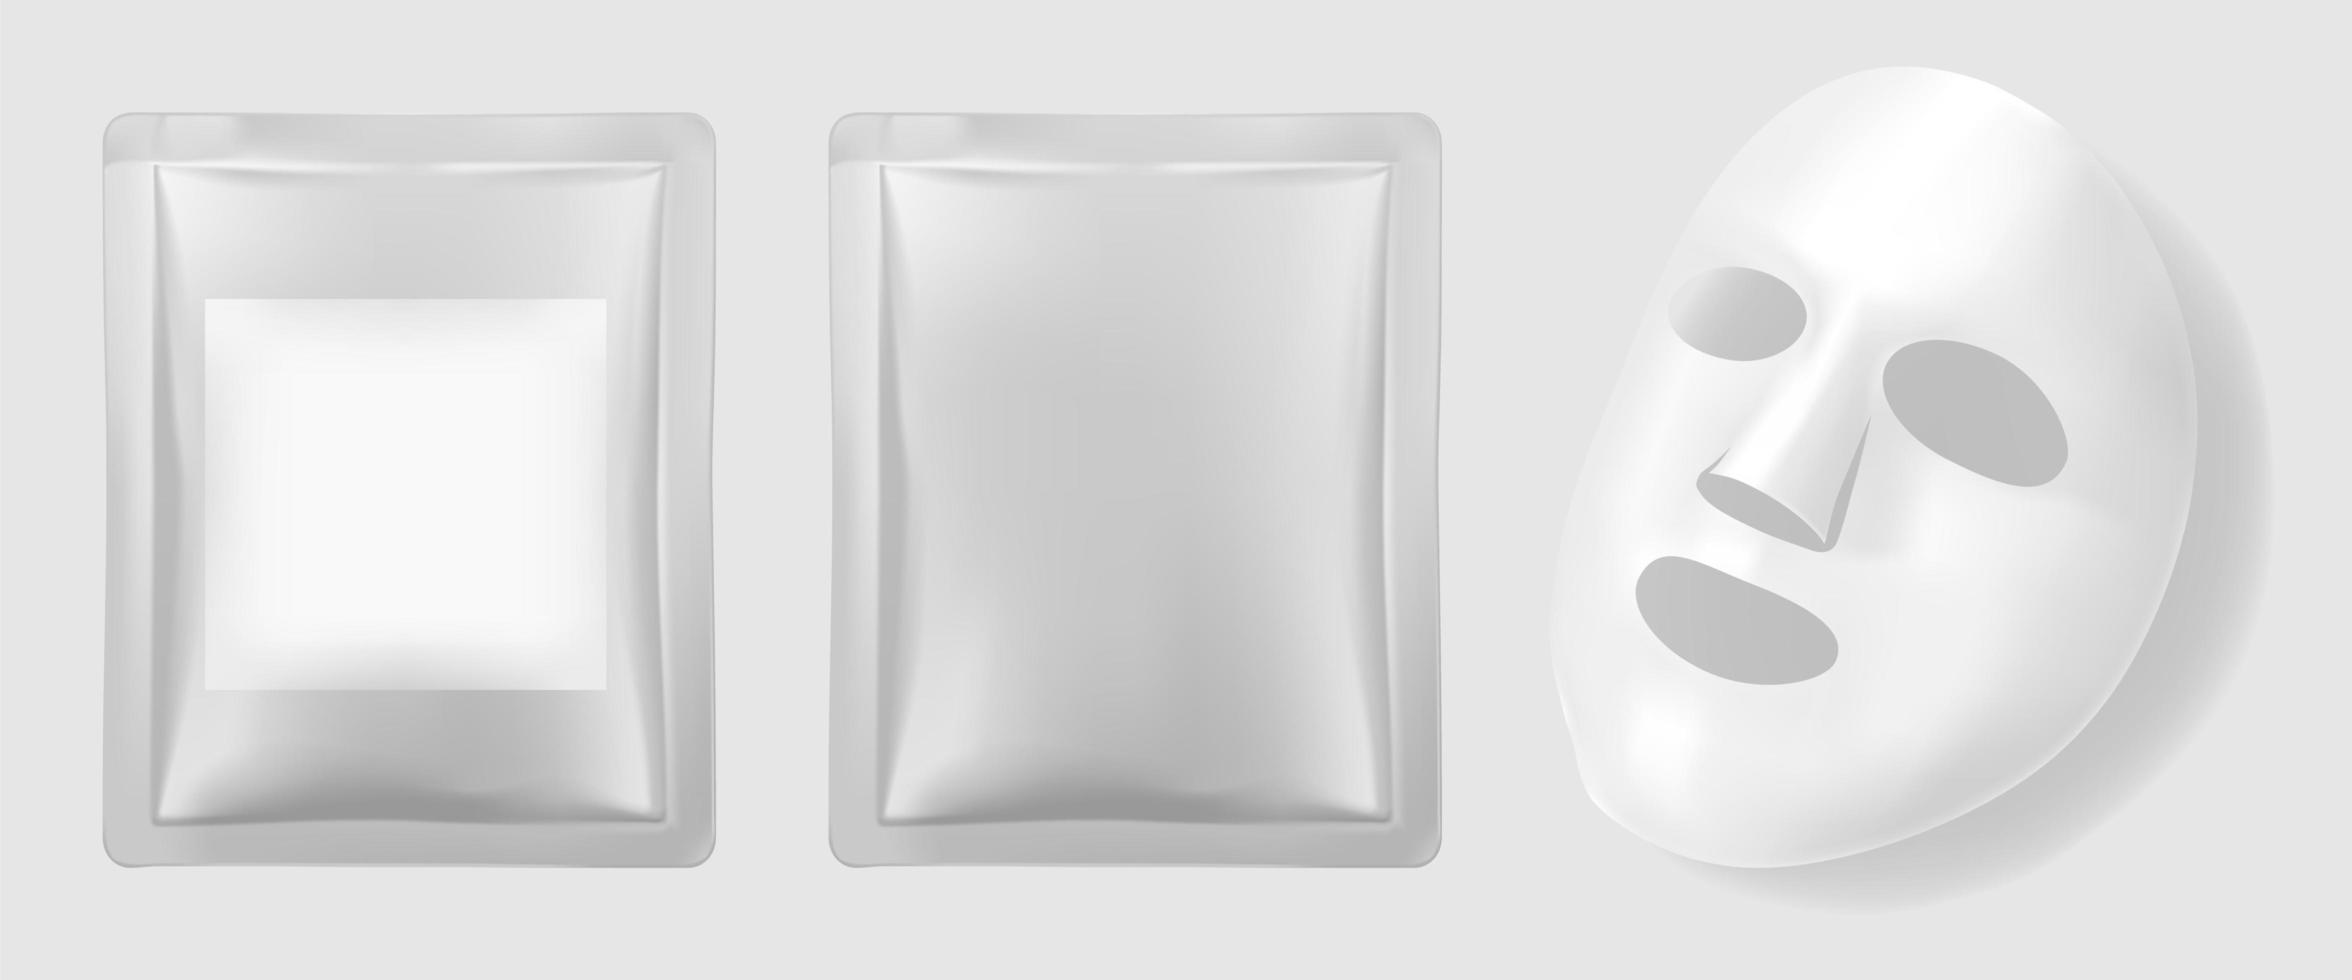 embalaje de mascarilla facial vector